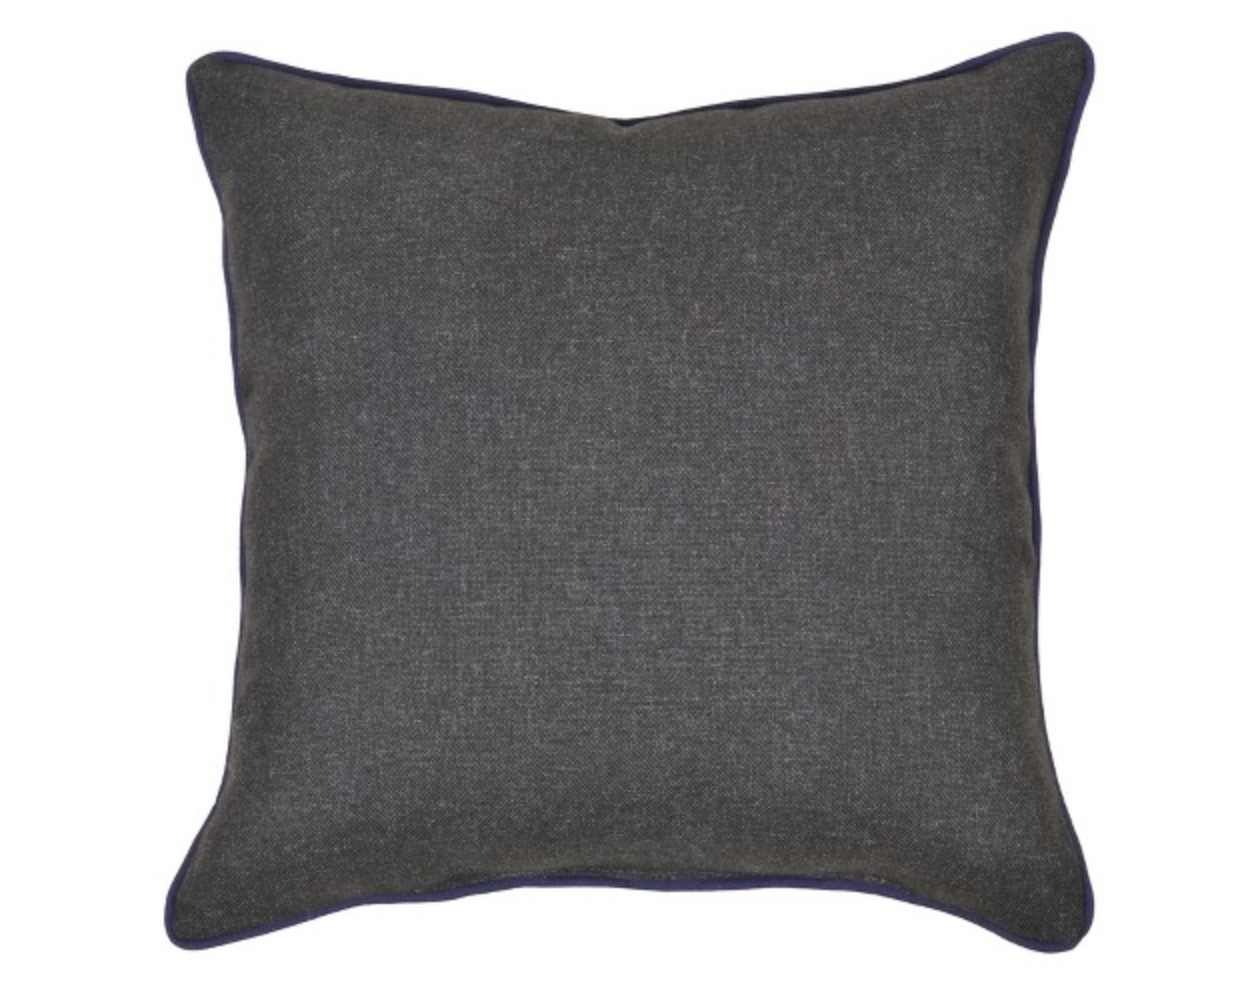 Target Outdoor Pillow black